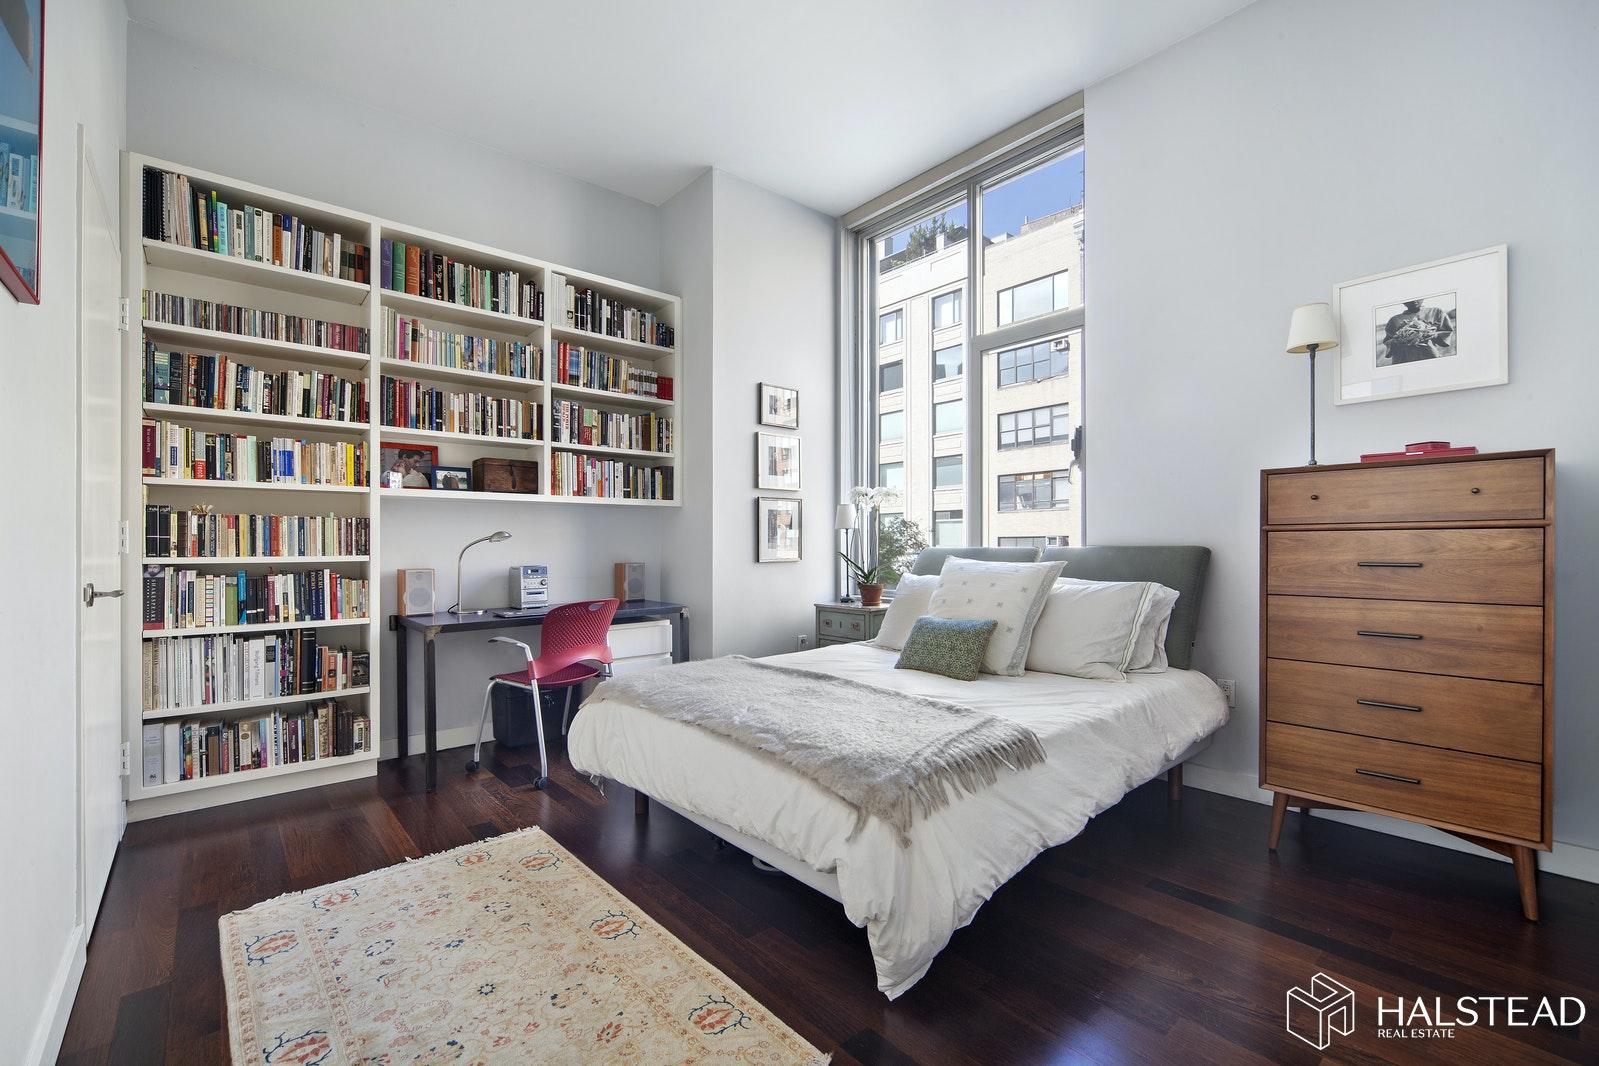 475 GREENWICH STREET 2C, Tribeca, $1,299,000, Web #: 20333447